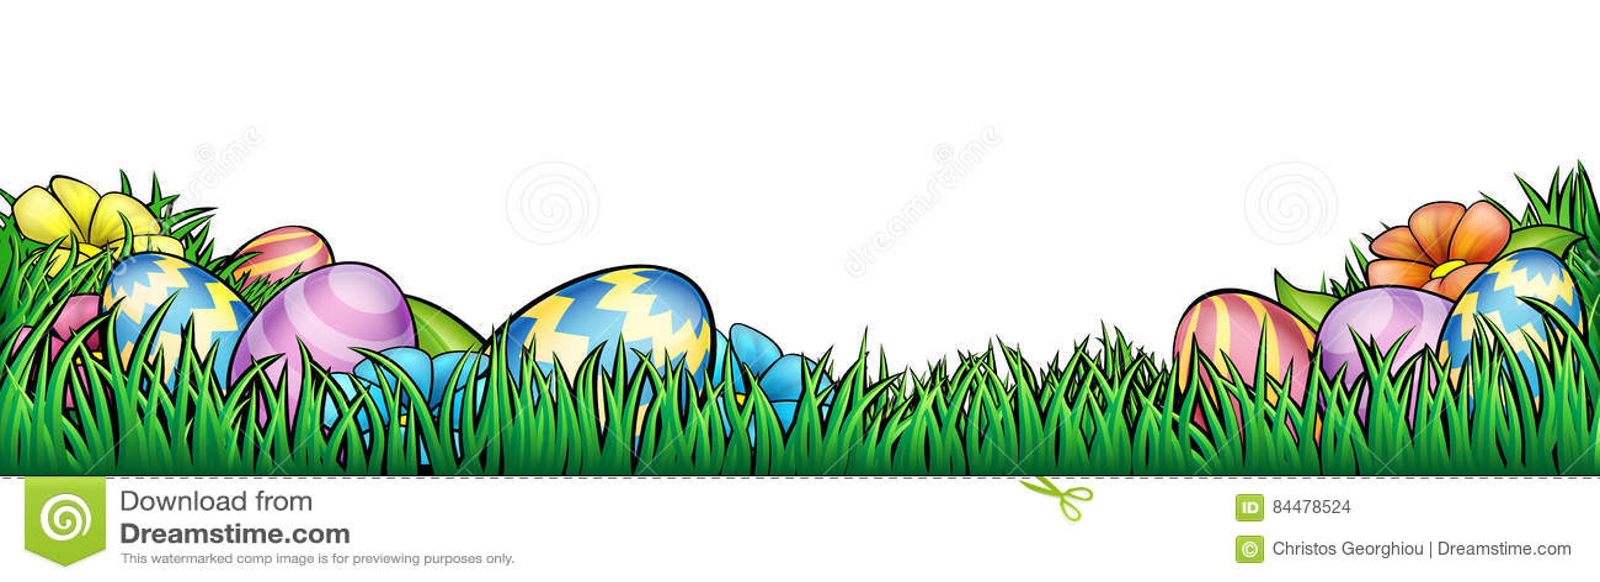 Easter Eggs Background stock vector. Illustration of ester - 84478524